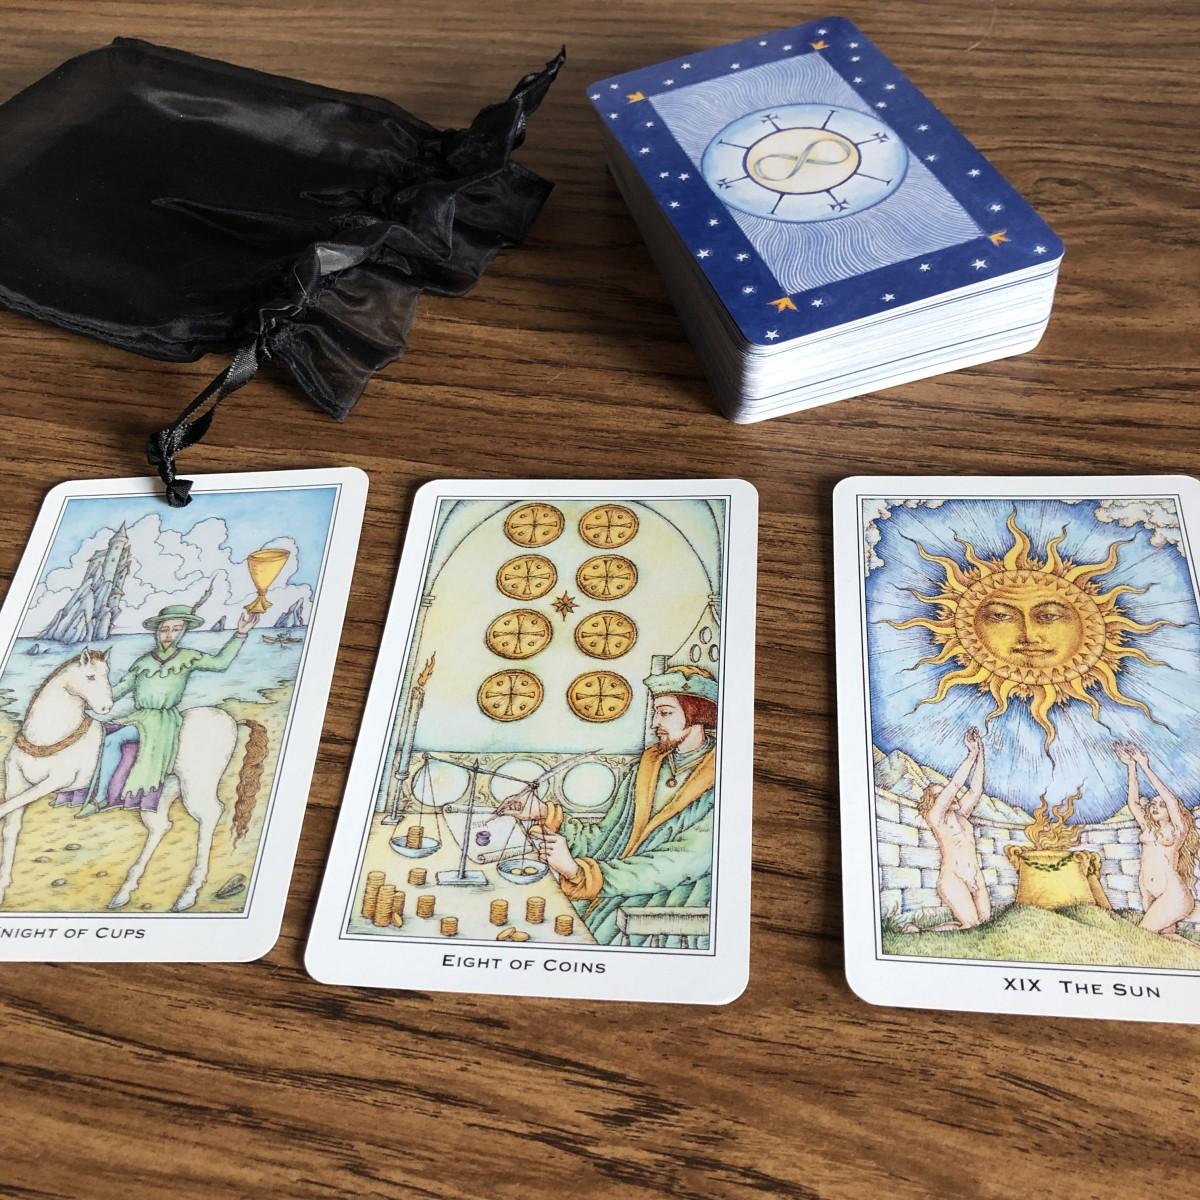 A pretty deck of tarot cards.